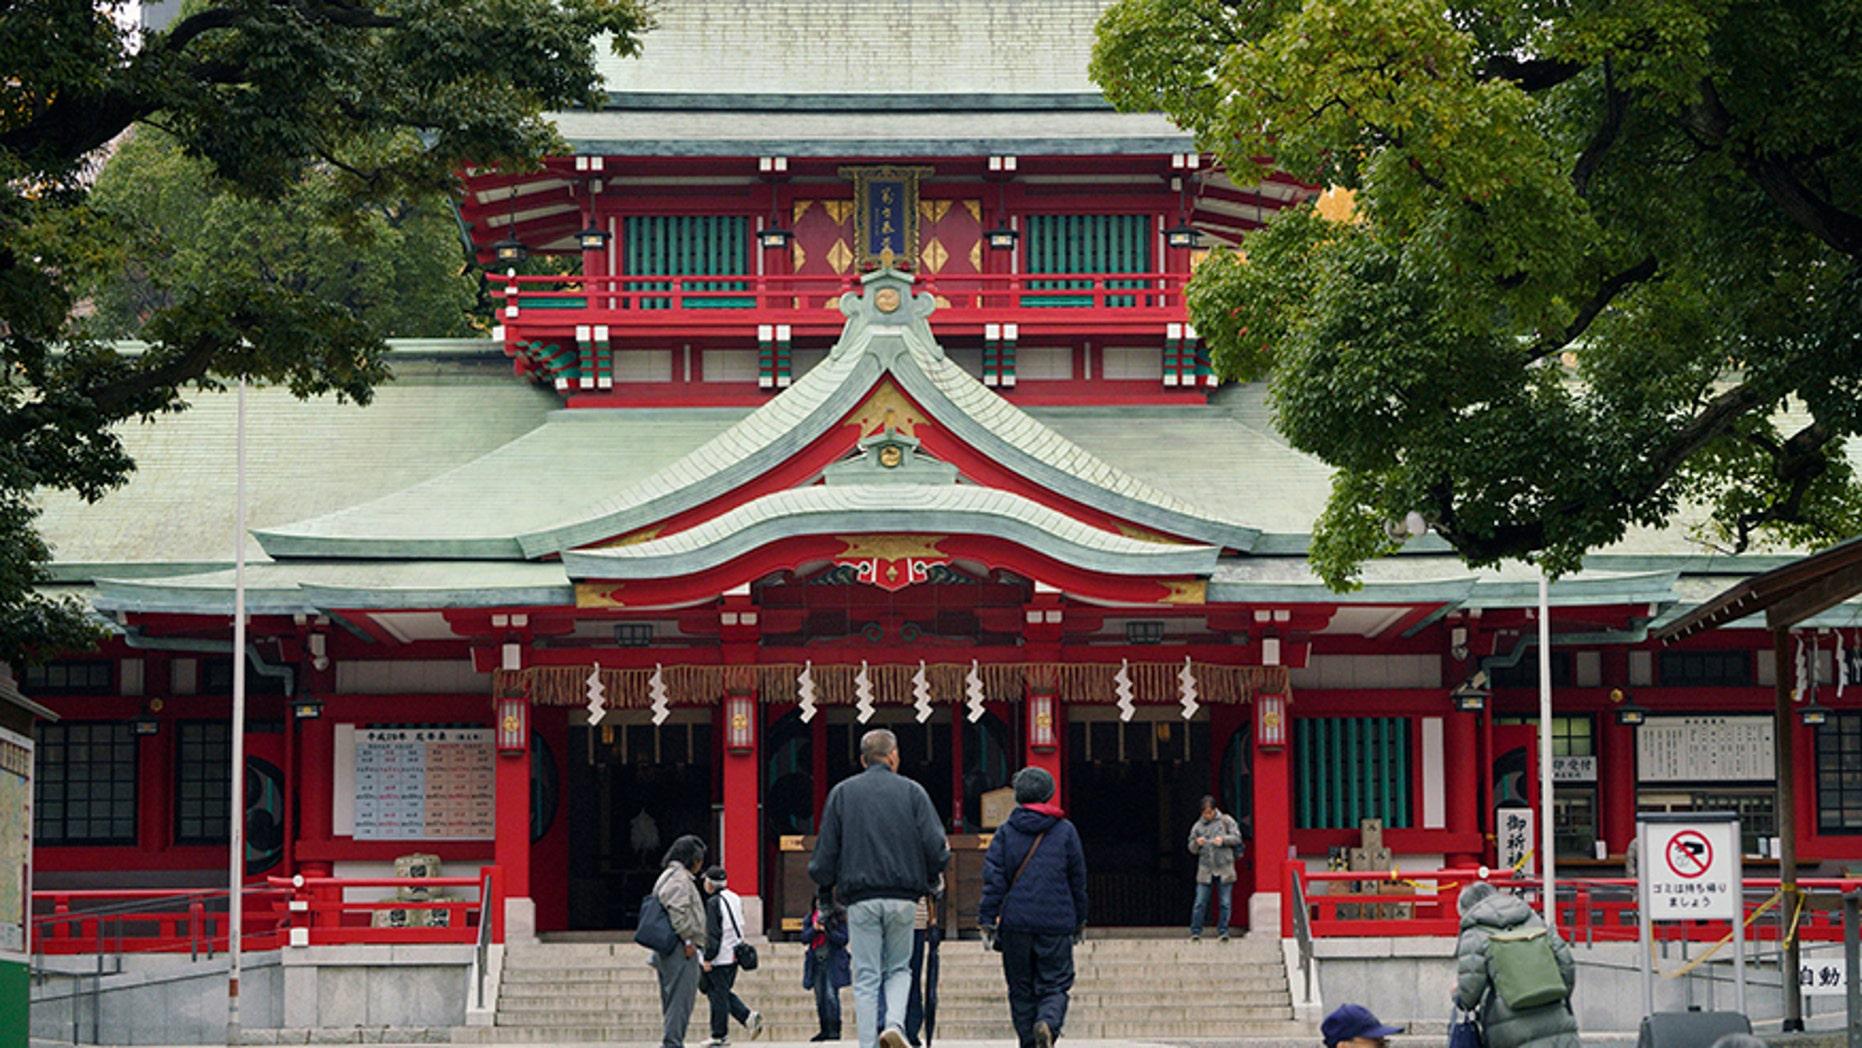 A man wielding a samurai sword killed a Shinto priestess at a prominent Tokyo shrine.